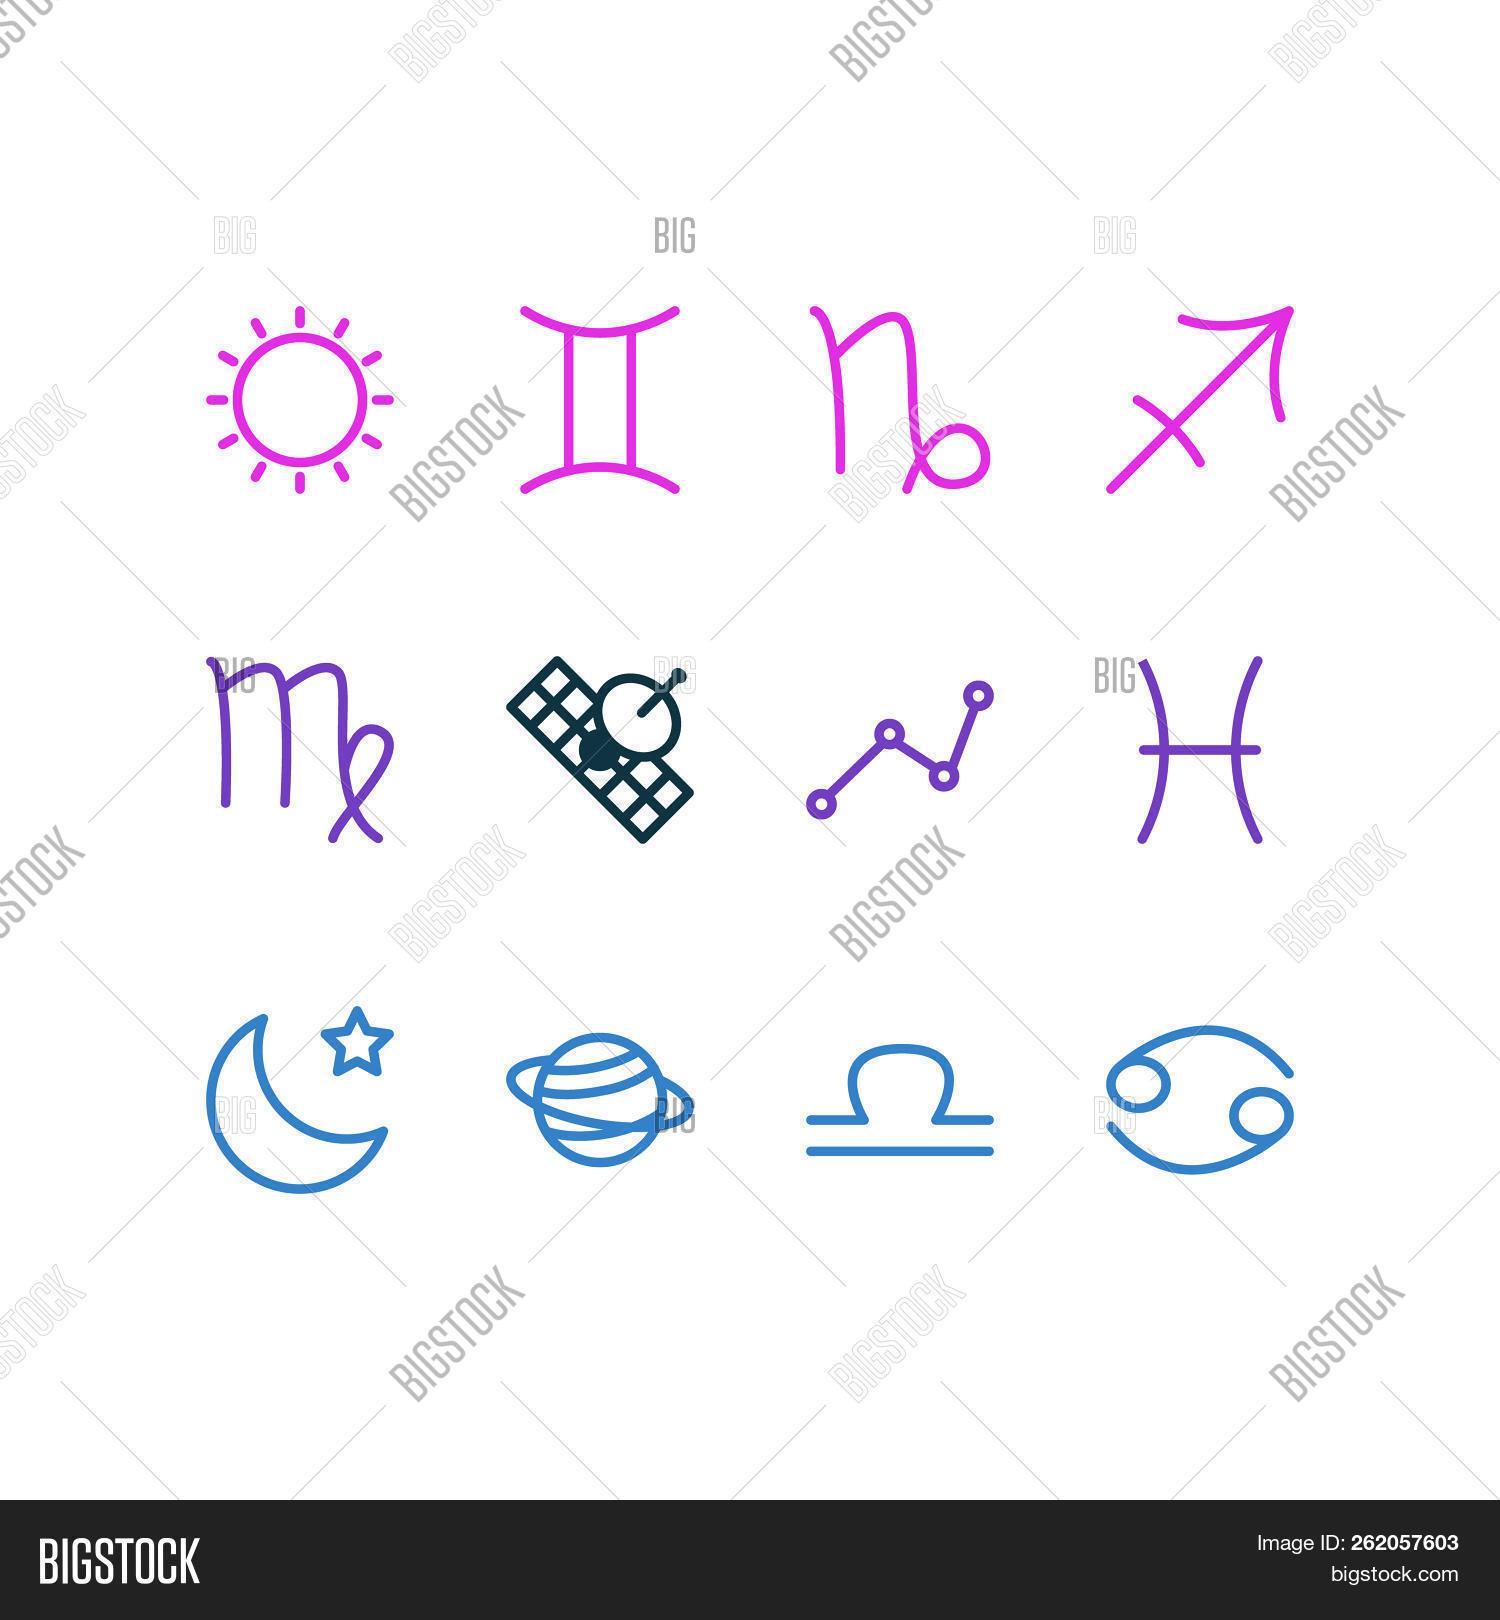 antenna,artistic,astrology,astronomy,attendant,calendar,cancer,capricorn,collection,constellation,contour,cosmos,crab,esoteric,fortune,galaxy,girl,glow,horoscope,icon,line,month,moon,mythology,night,outline,pisces,planet,sagittarius,satellite,saturn,science,set,sign,sky,space,sputnik,star,stellar,sunny,sunshine,telecommunication,virgo,web,zodiac,zodiacal